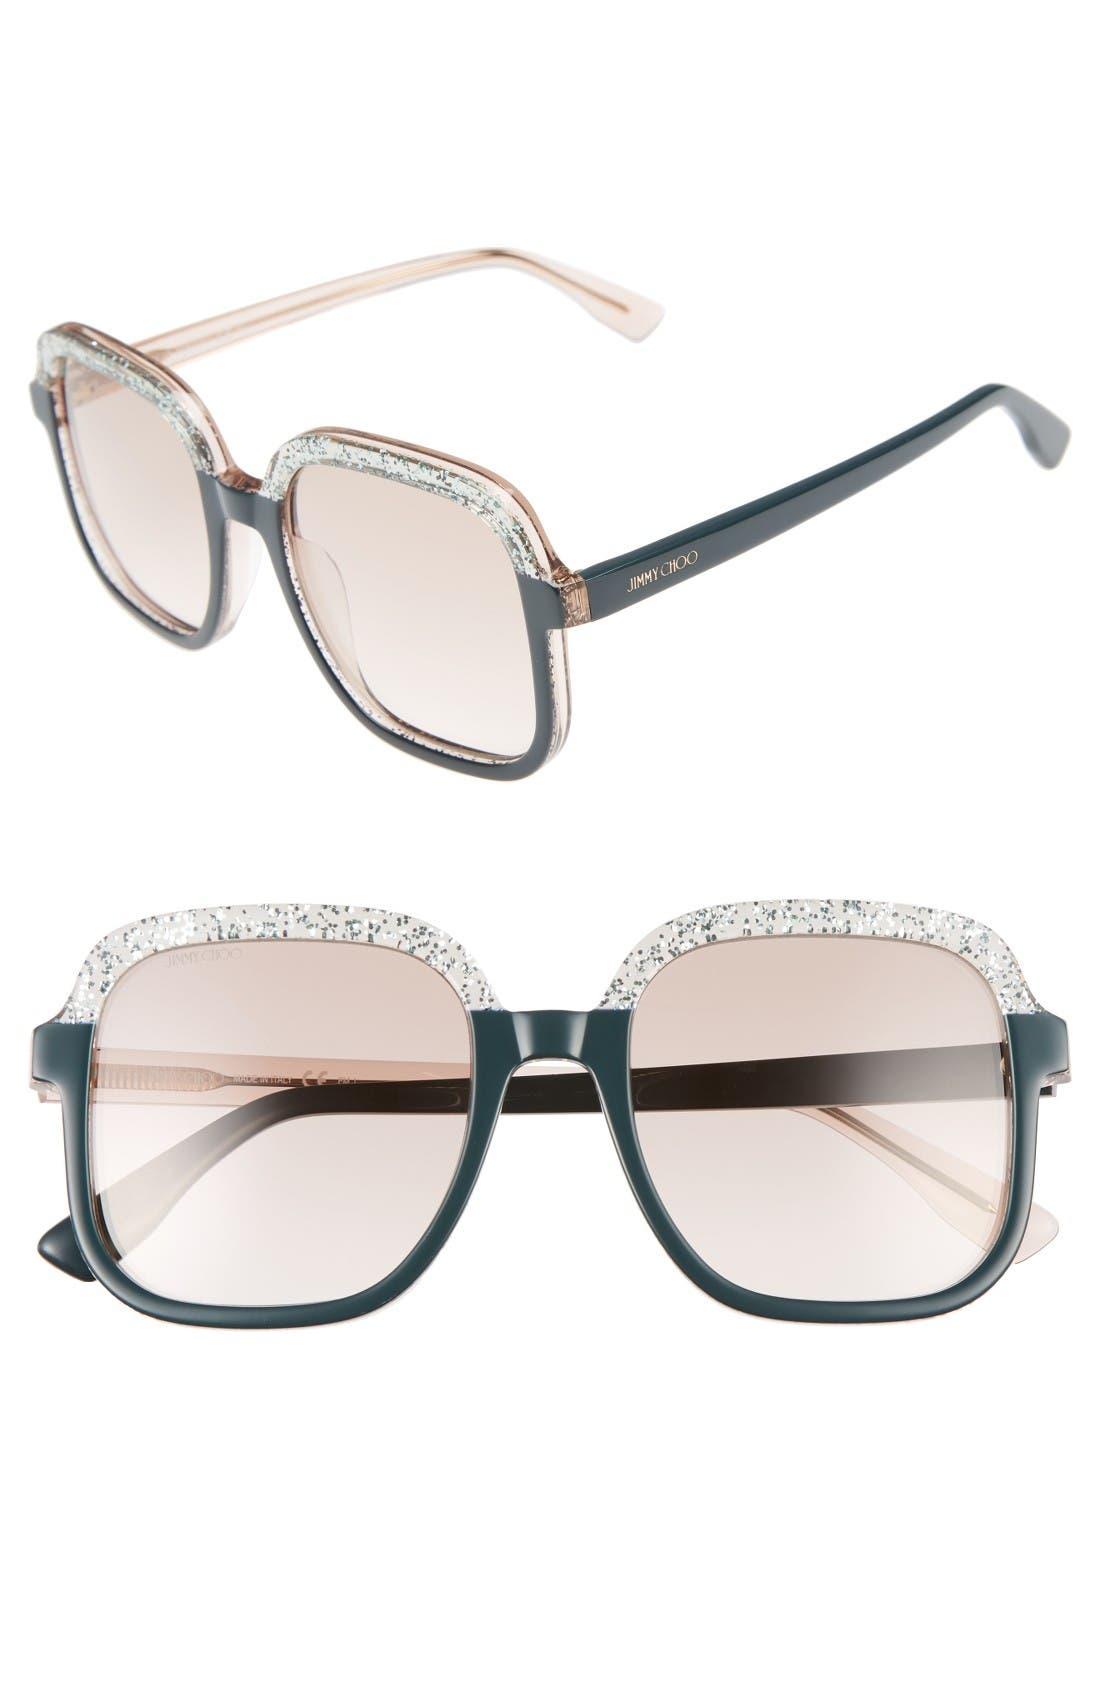 Main Image - Jimmy Choo 53mm Glitter Frame Sunglasses